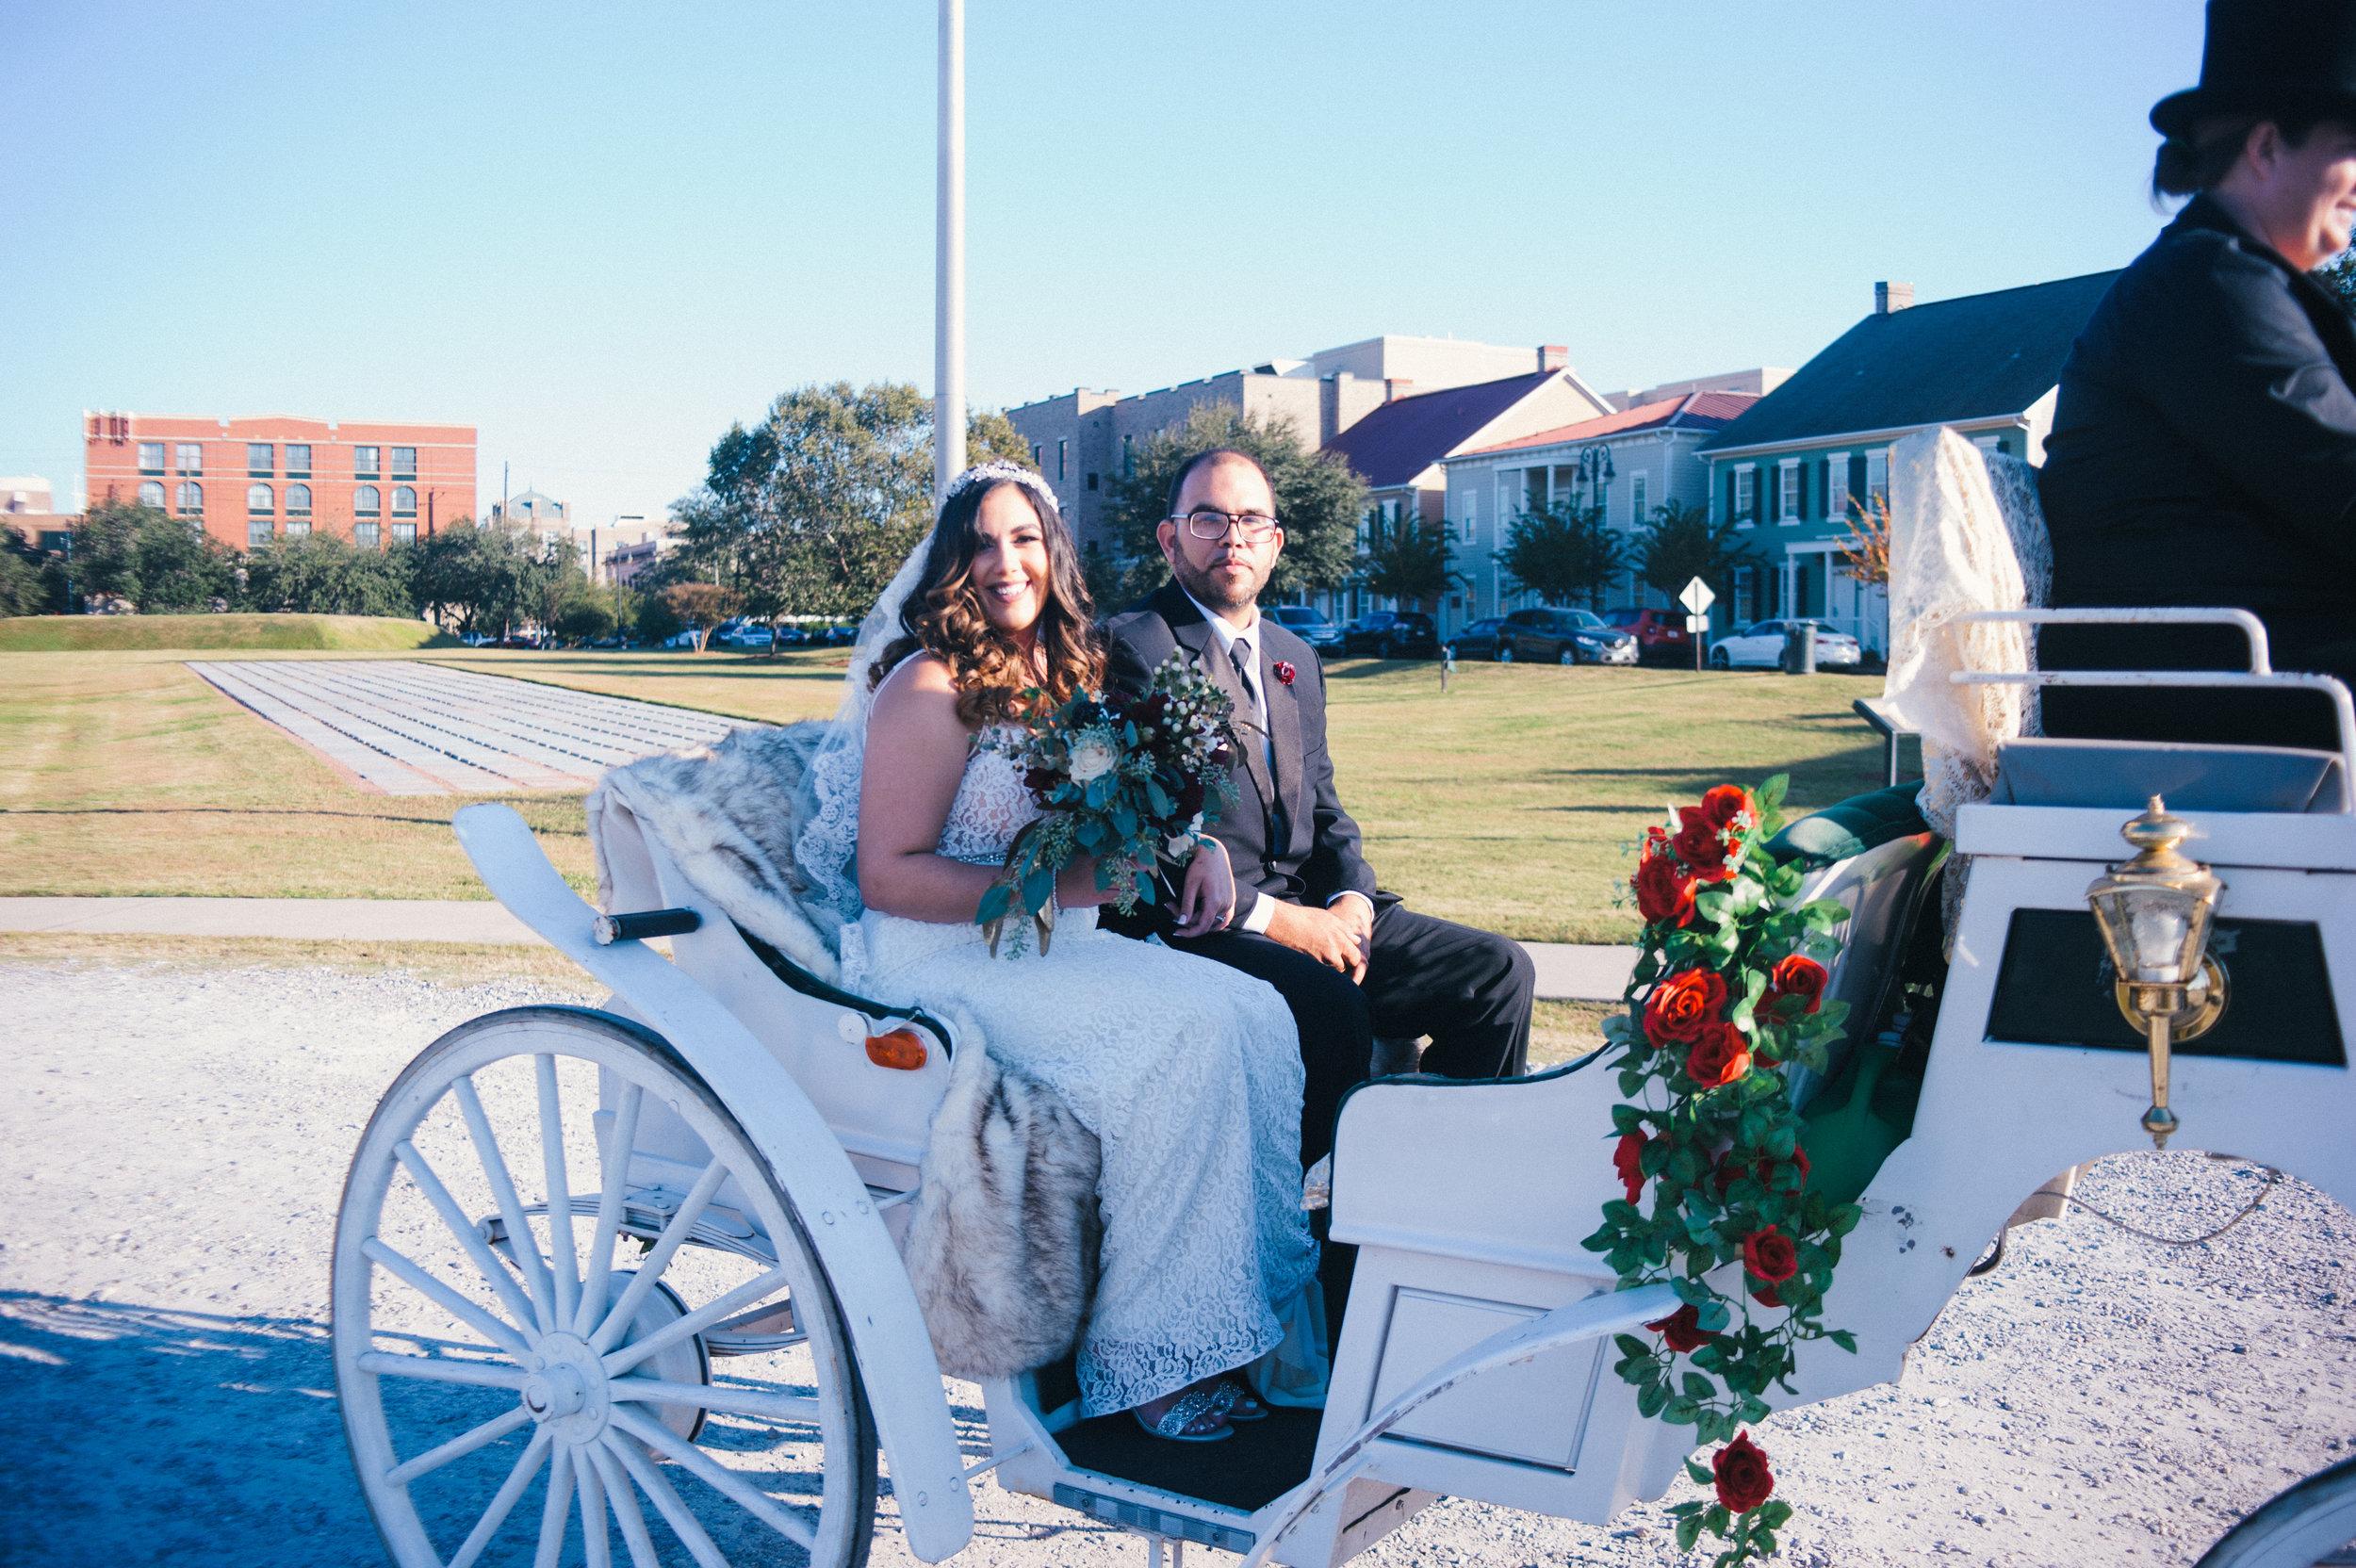 Iggy-and-yesenia-savannah-railroad-museum-wedding-meg-hill-photo- (343 of 866).jpg